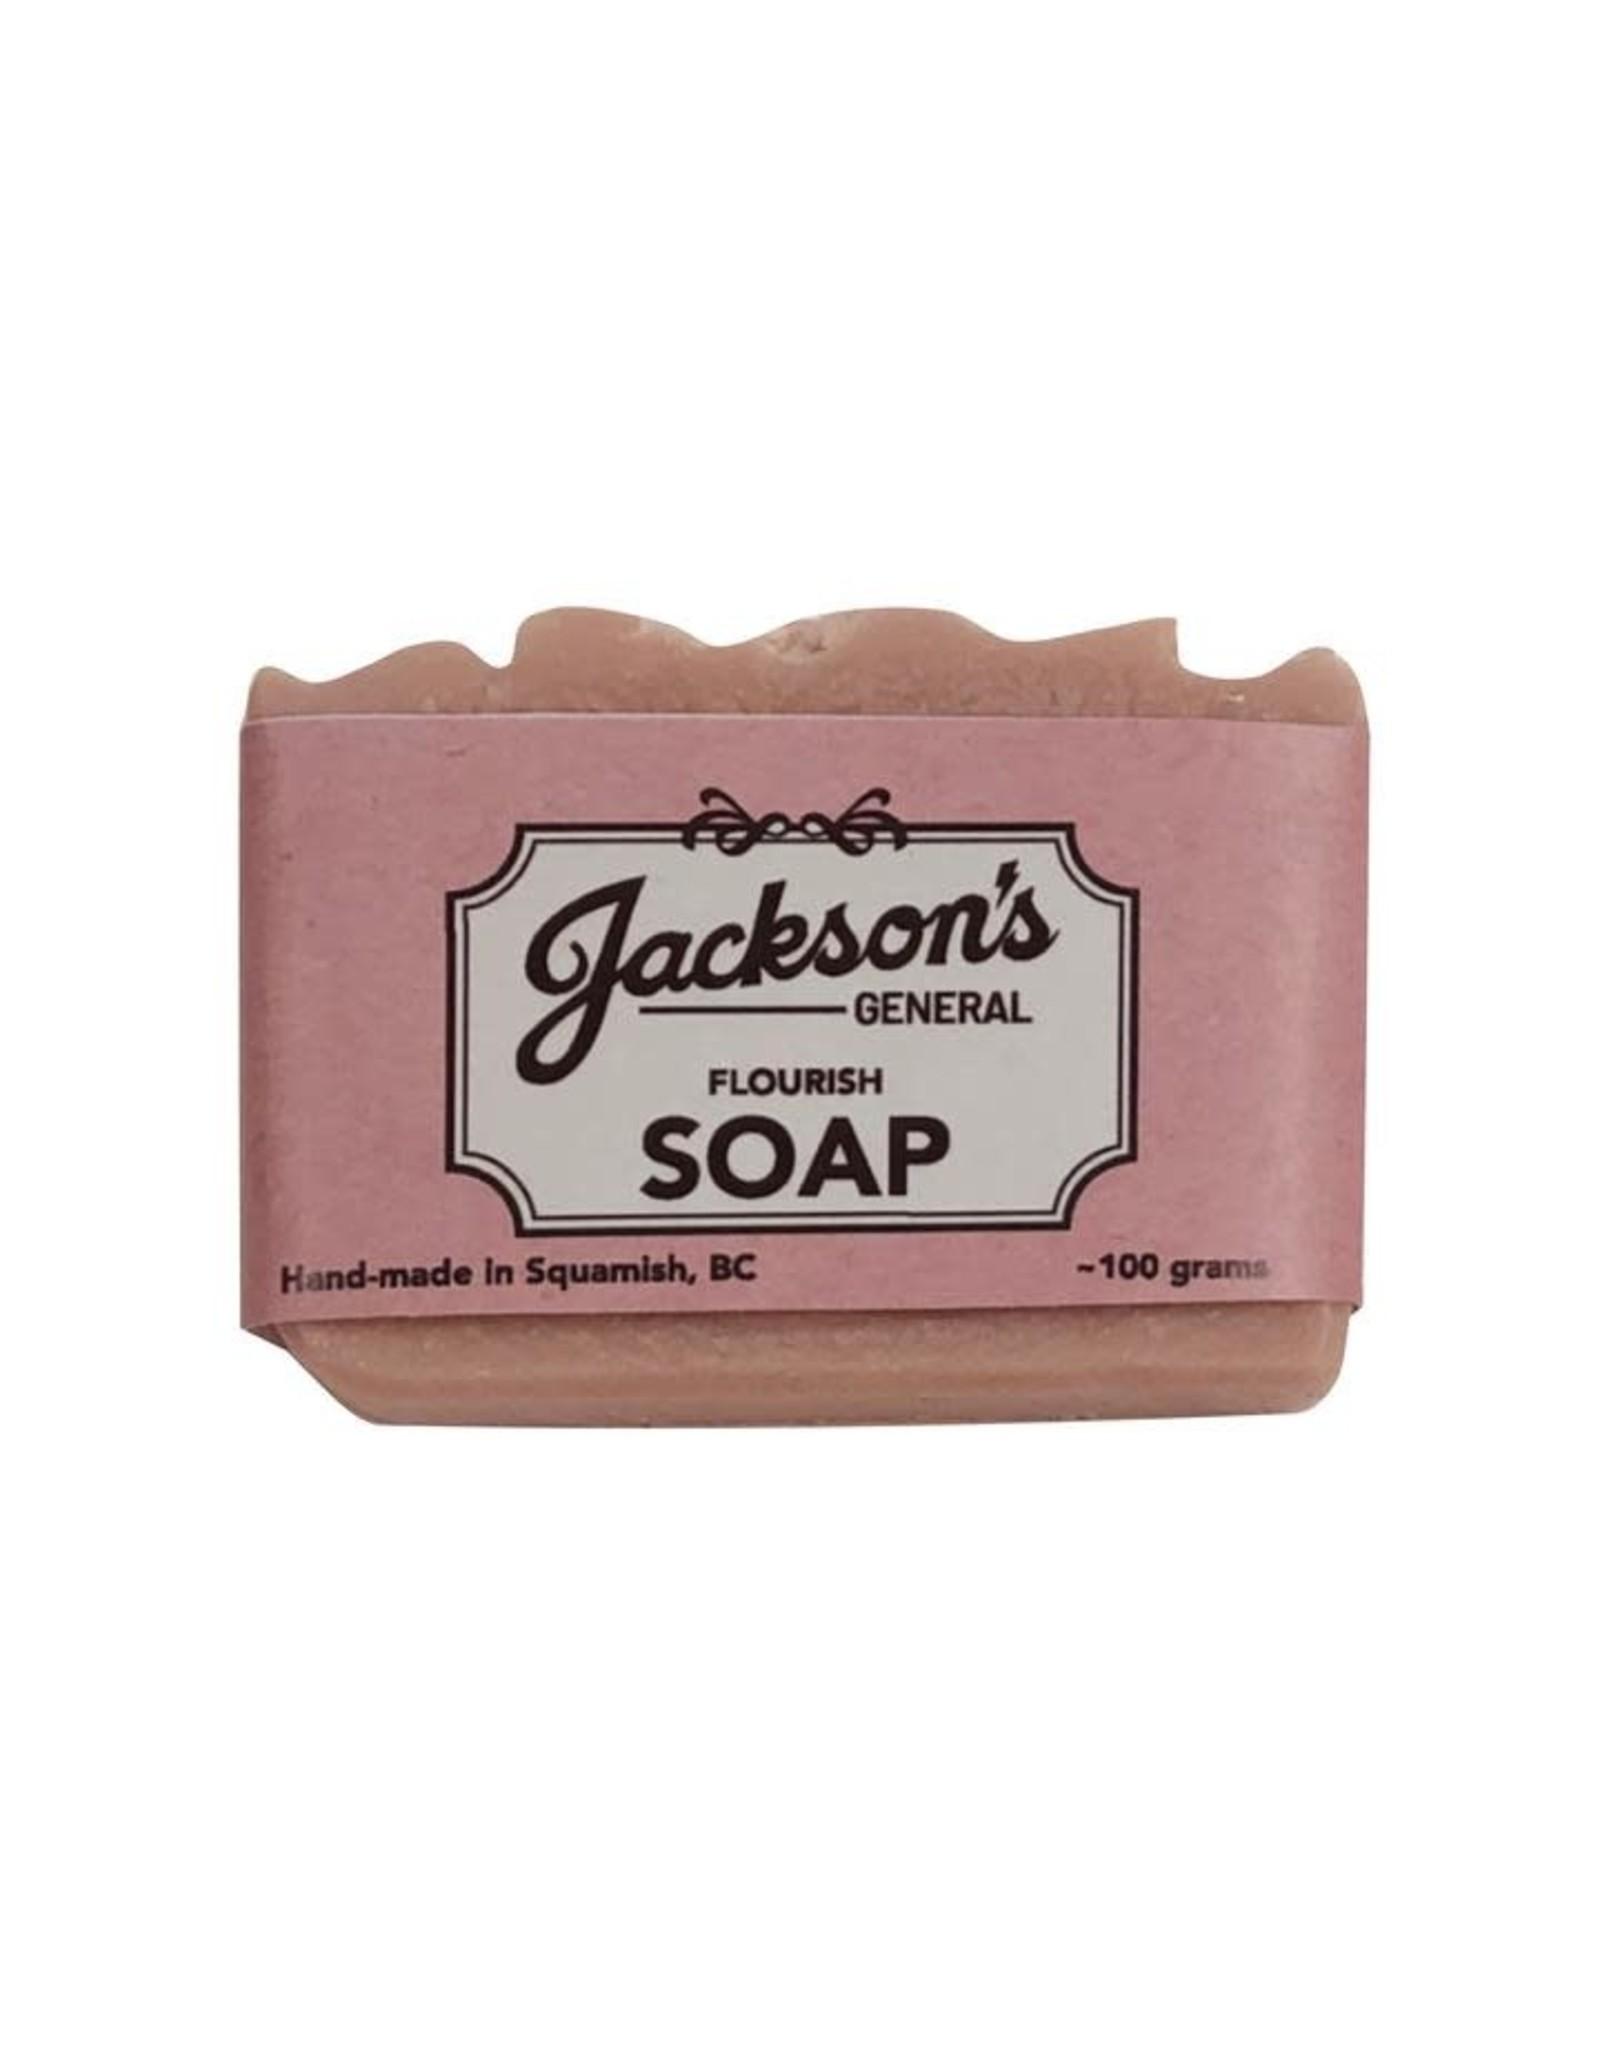 Jackson's General Jackson's General Soap Flourish